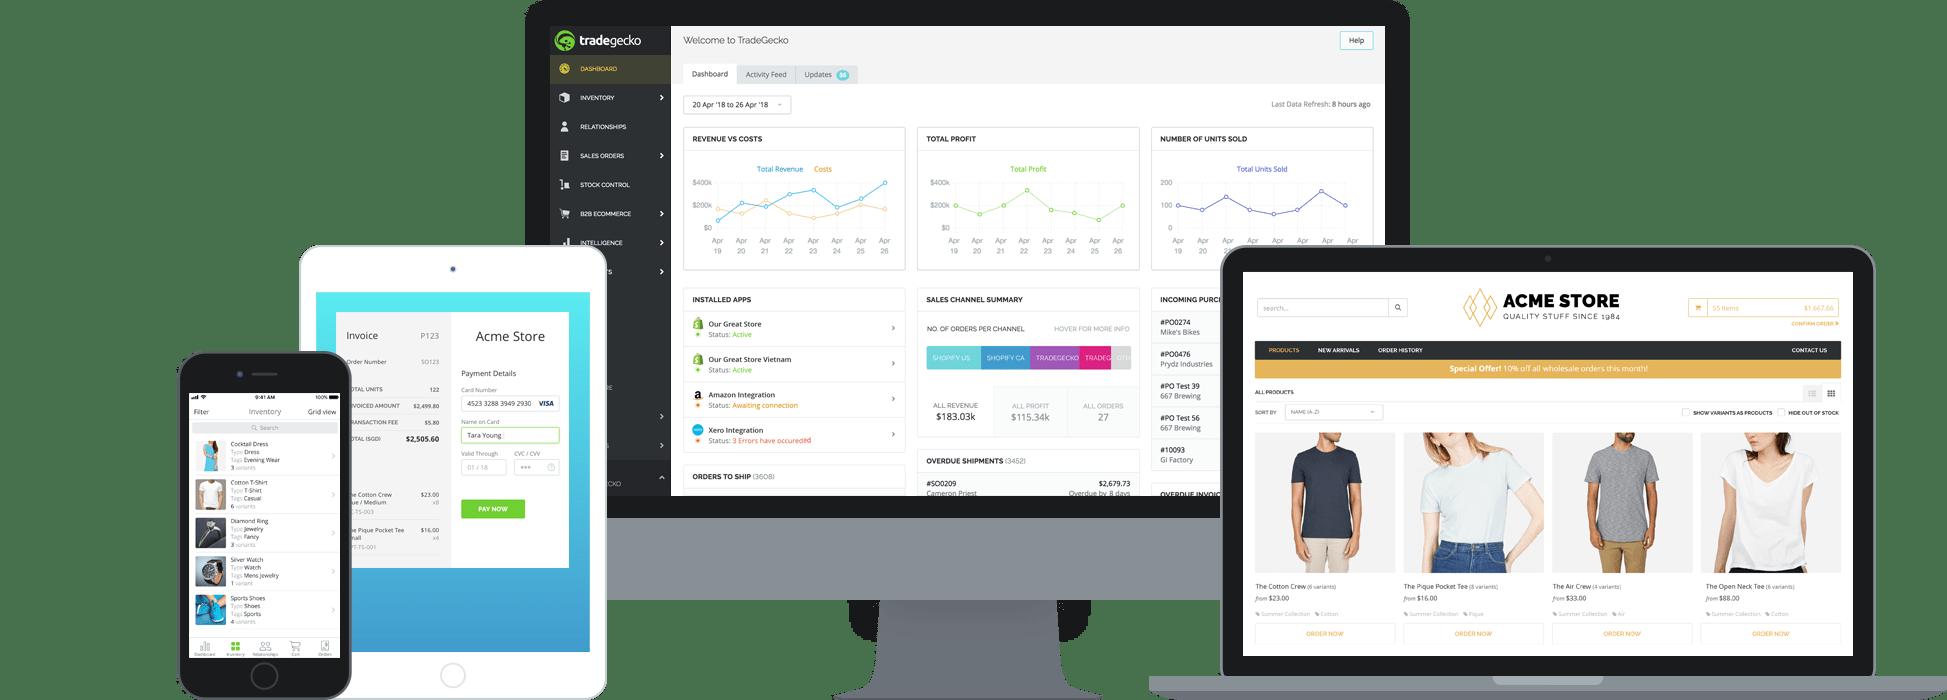 TradeGecko Pro Enterprise Inventory Management Software